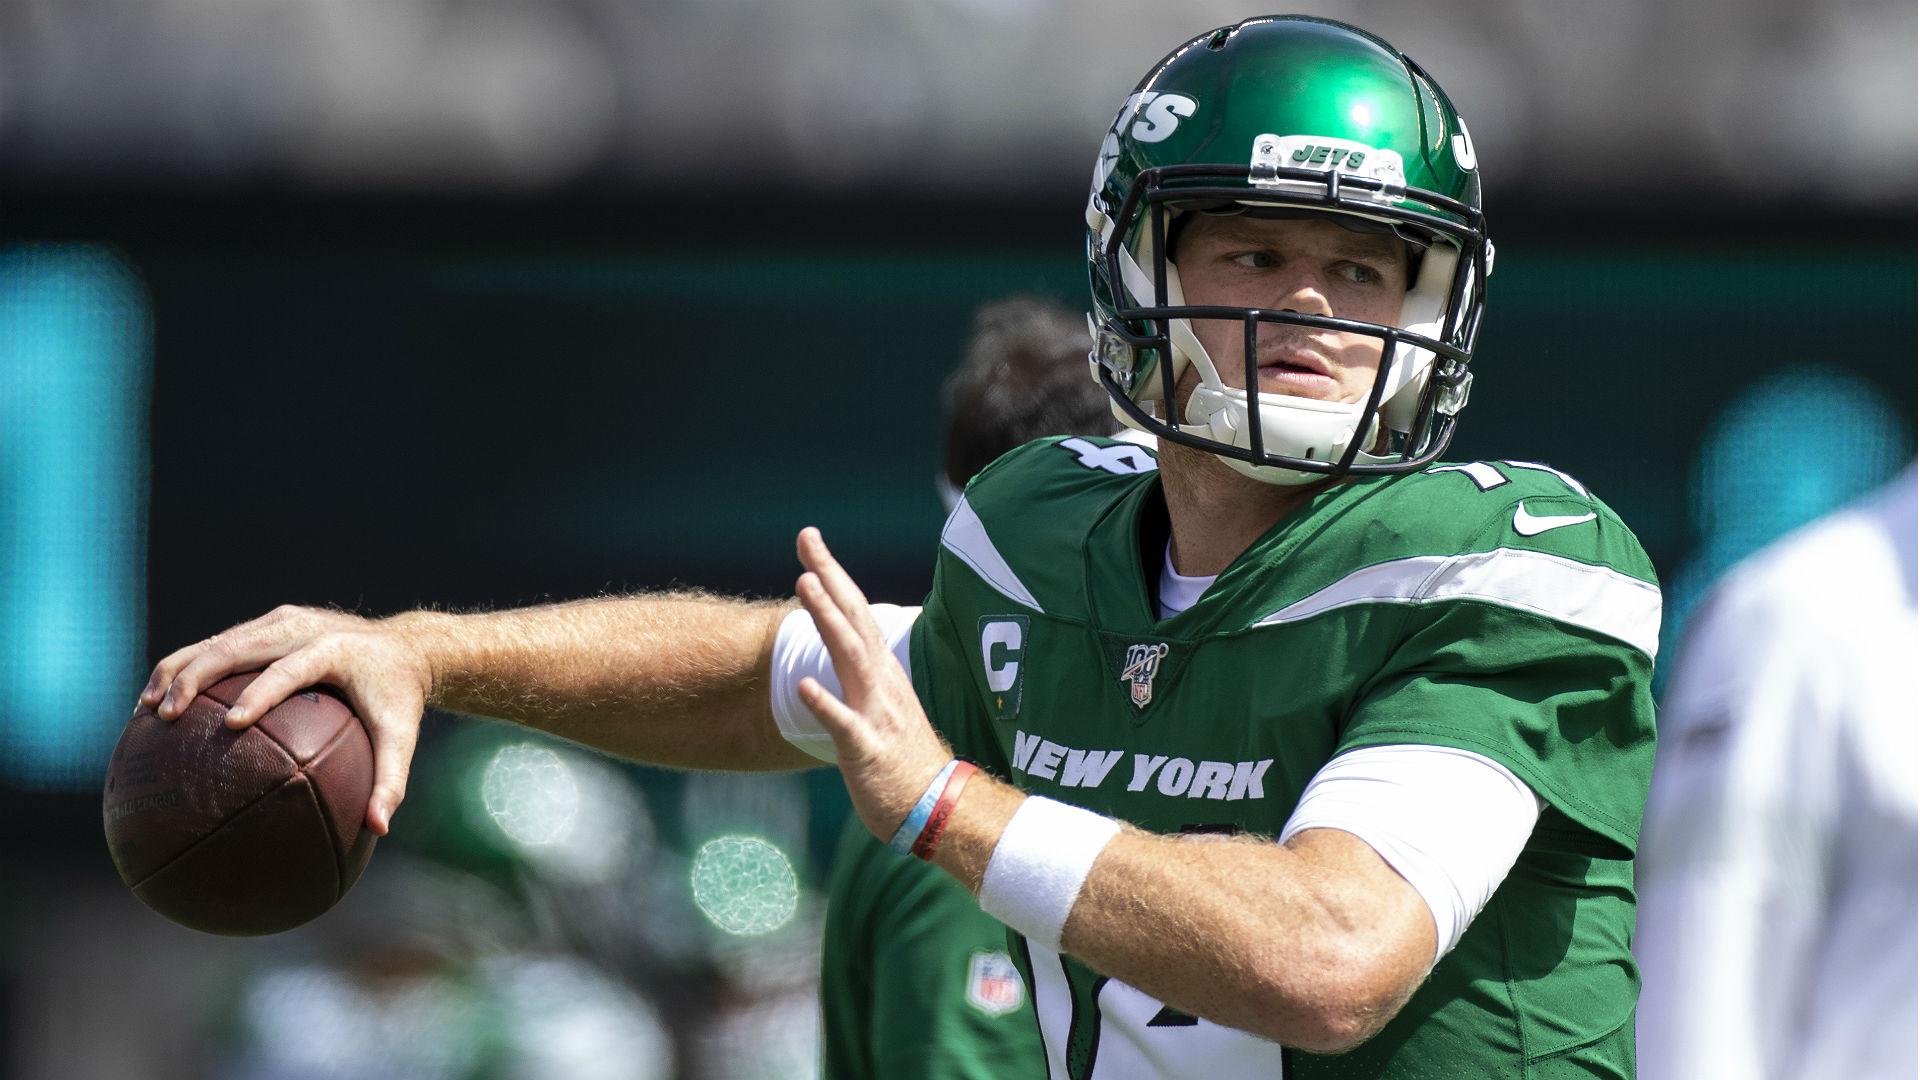 Sam Darnold health update: Jets QB has 'full confidence' he'll return in Week 5 vs. Eagles